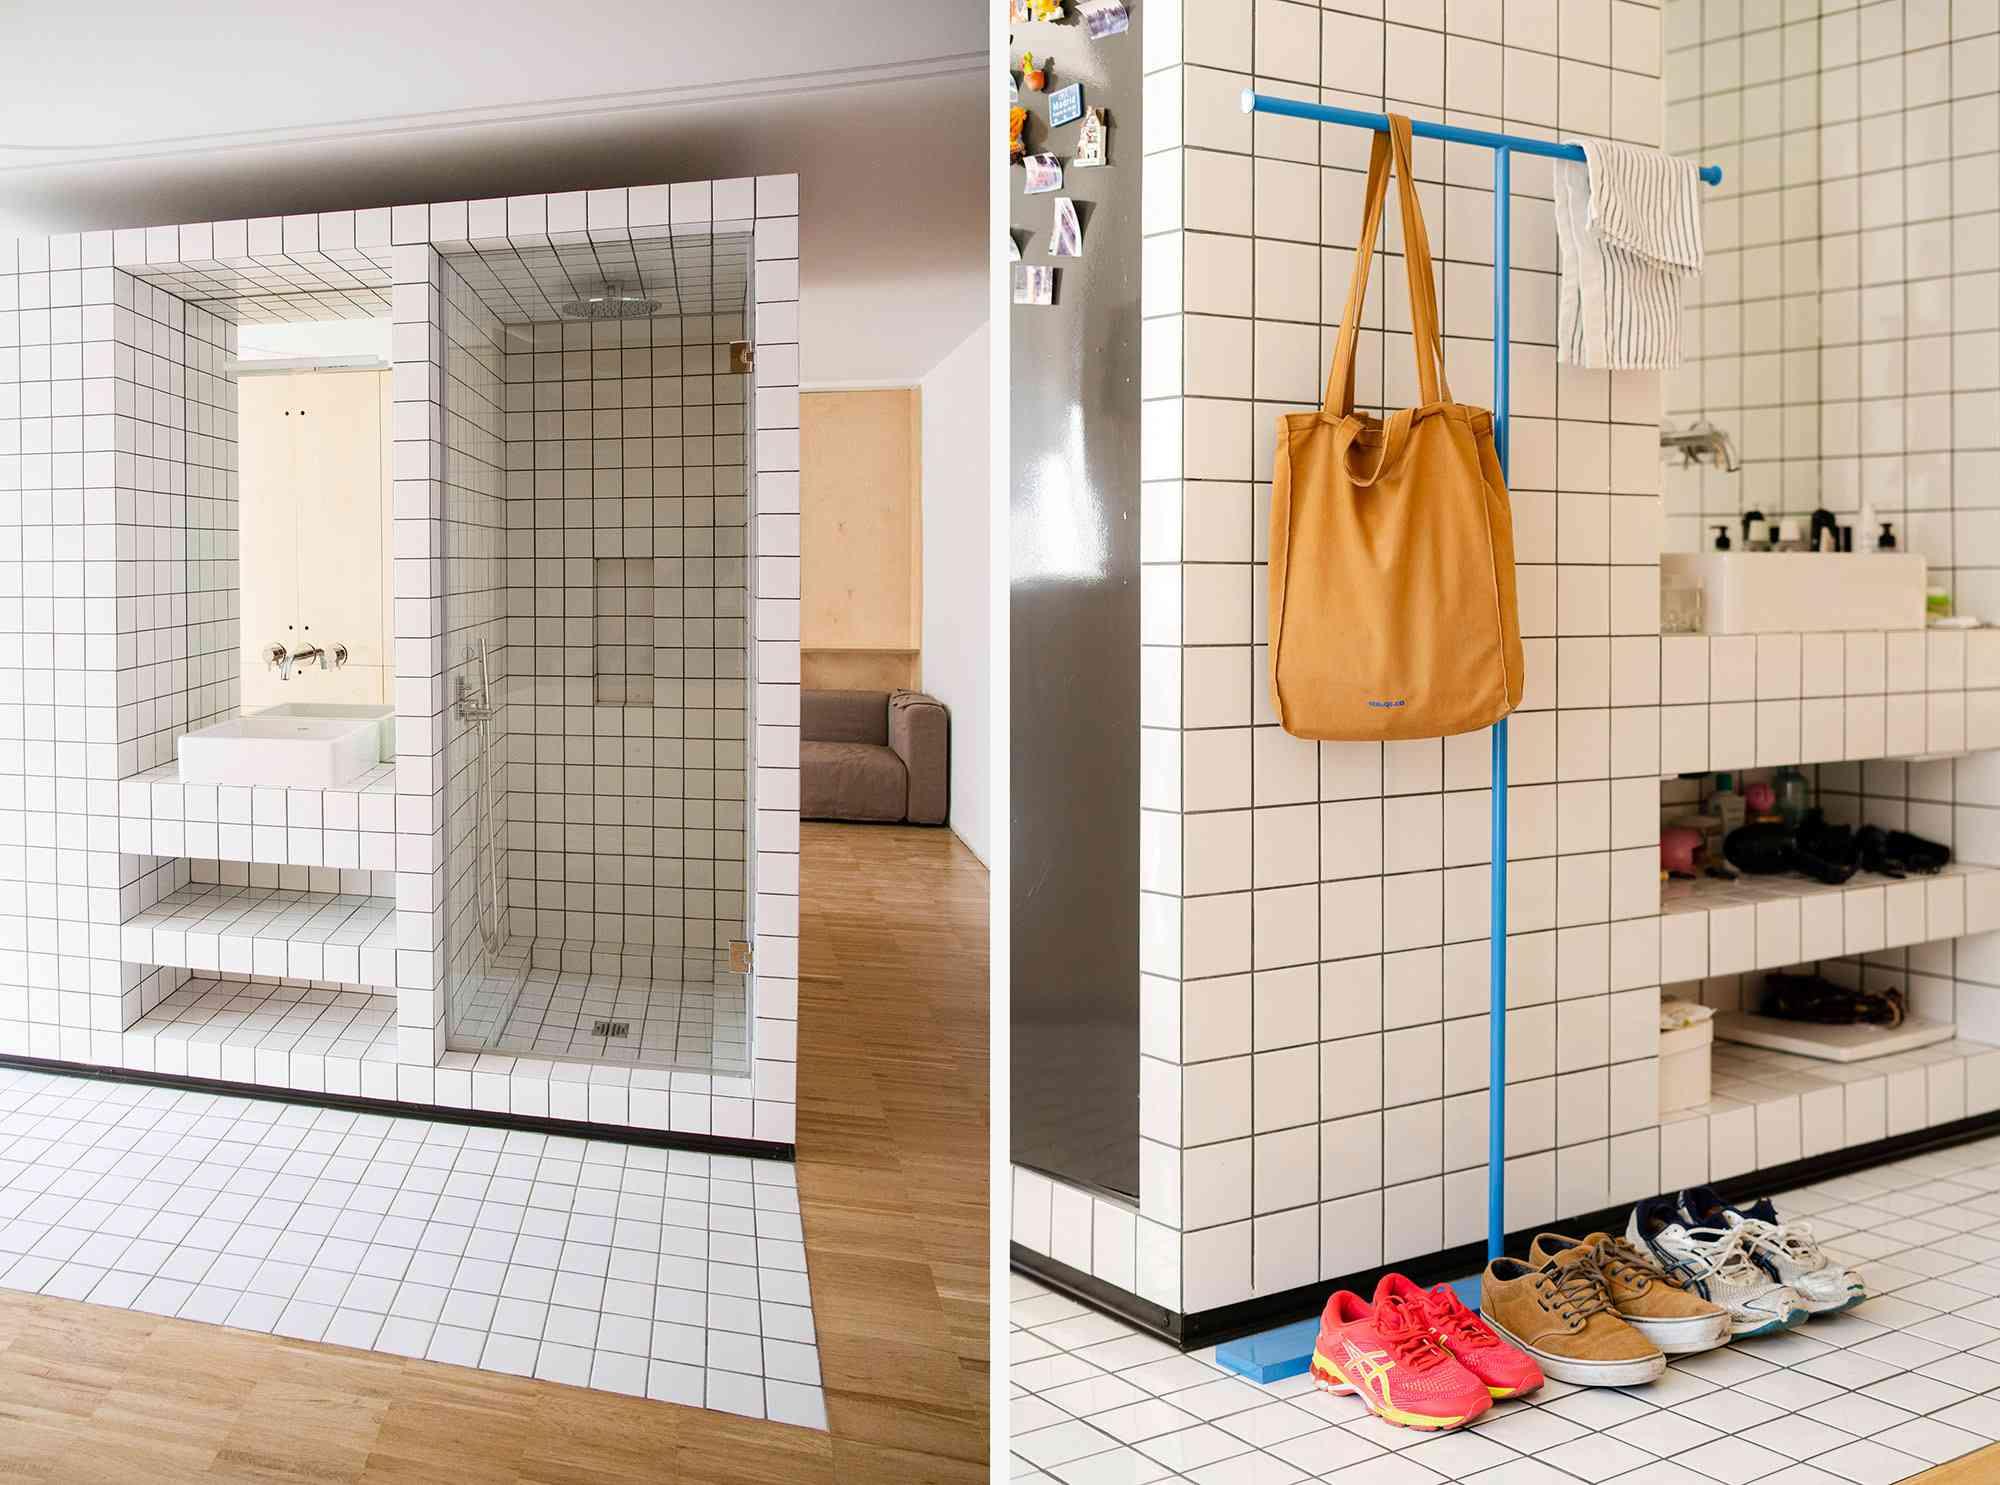 JM55 microapartment renovation by BURR Studio sink and shower